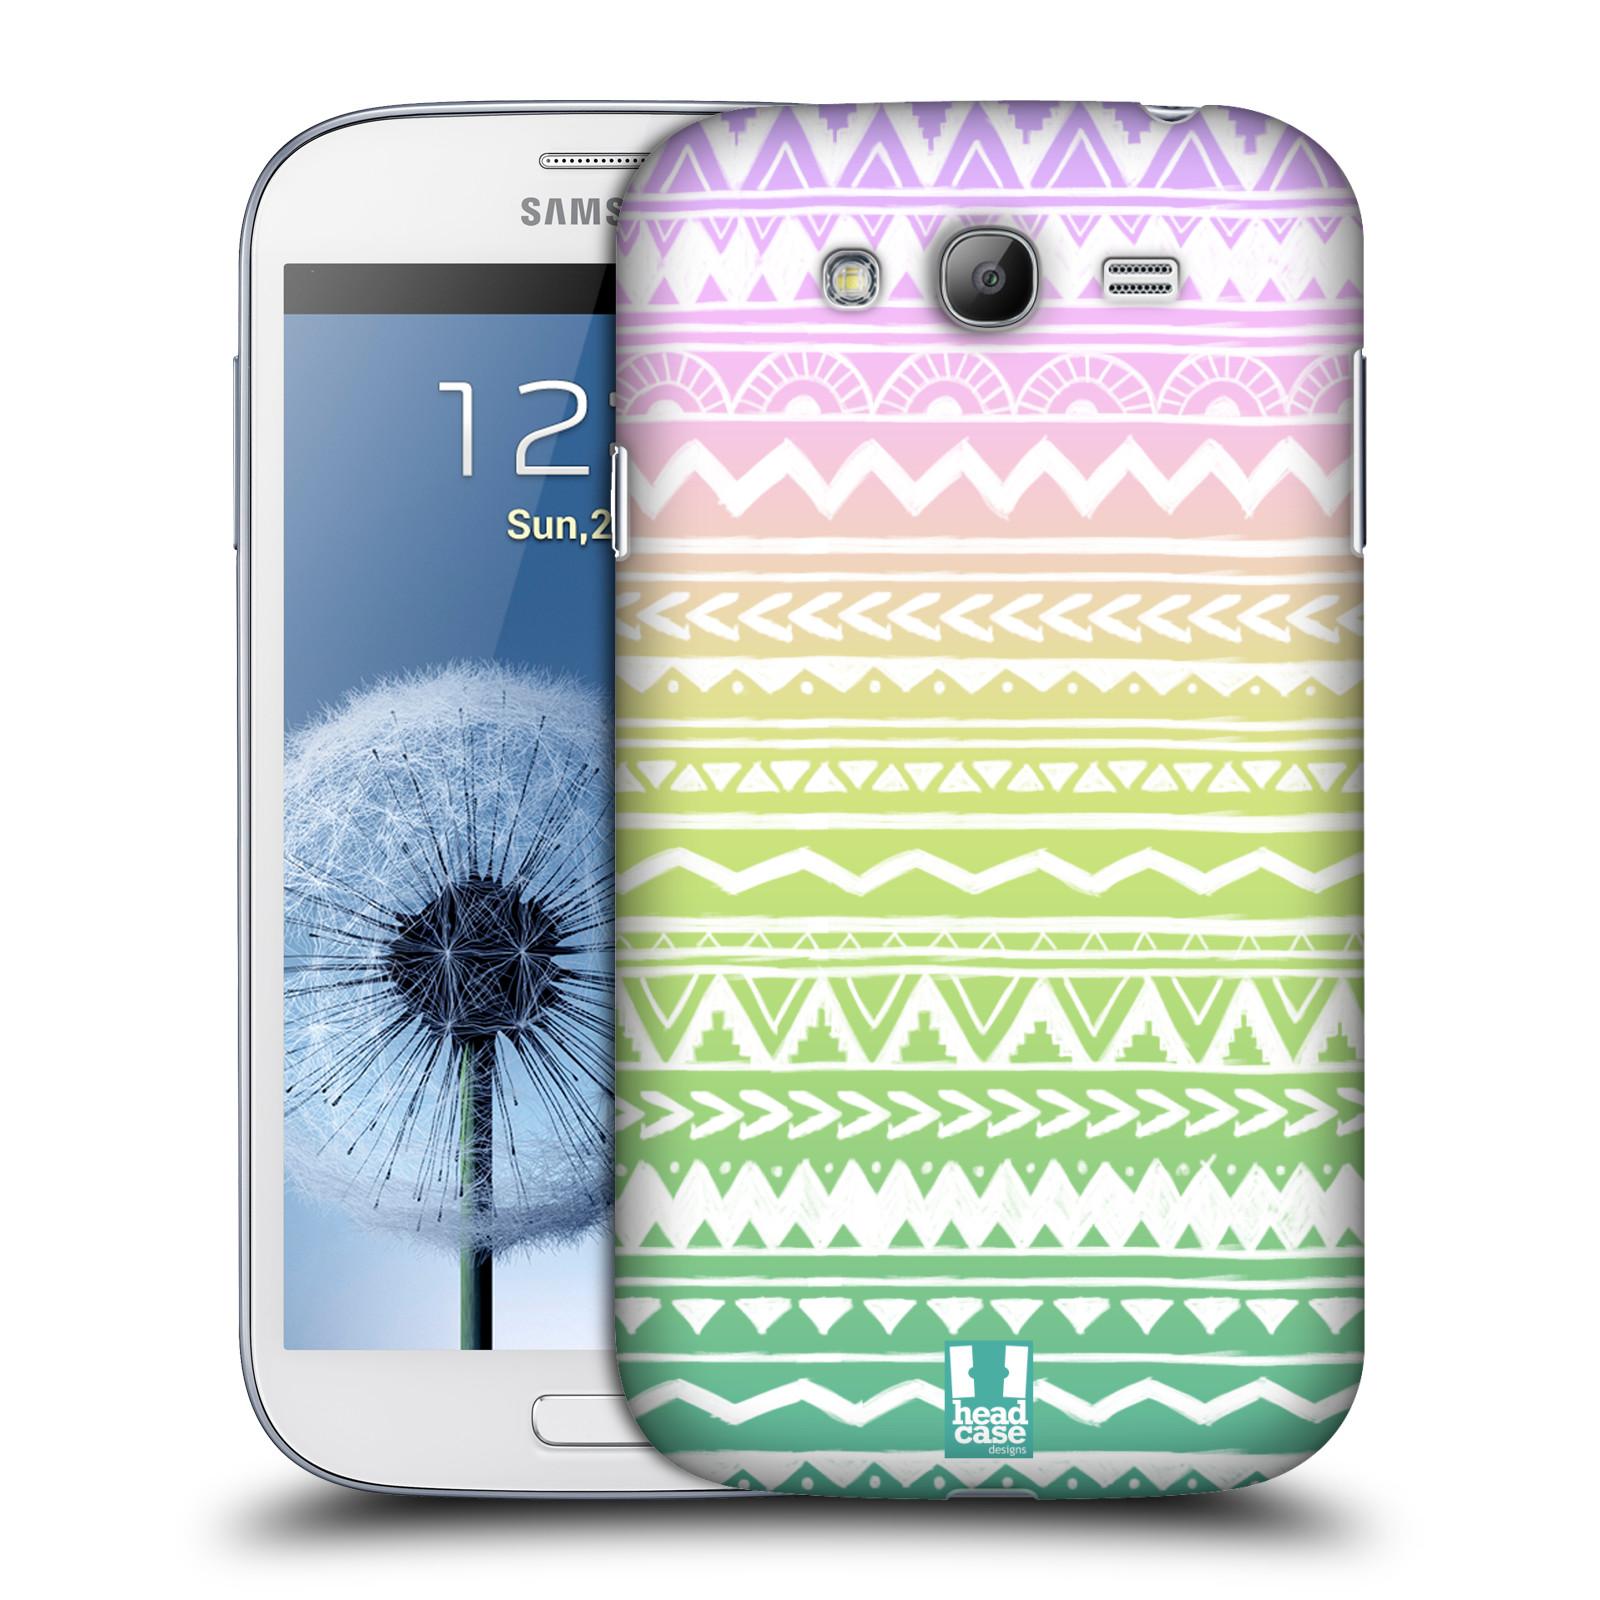 Plastové pouzdro na mobil Samsung Galaxy Grand Neo Plus HEAD CASE MIX AZTEC DRAWN (Kryt či obal na mobilní telefon Samsung Galaxy Grand Neo Plus GT-i9060i)